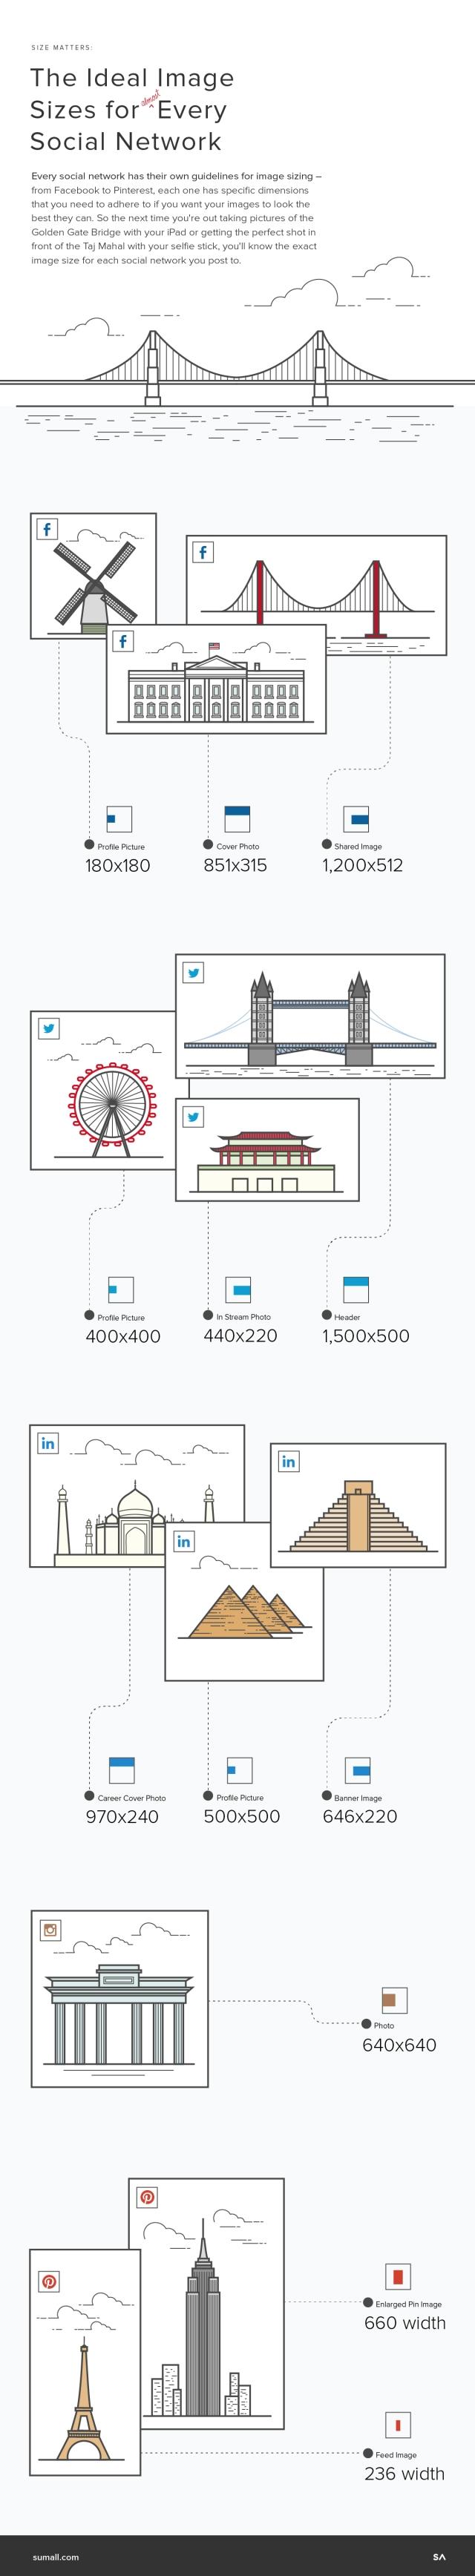 Social Media Optimisation The Ideal Image Sizes For Each Network